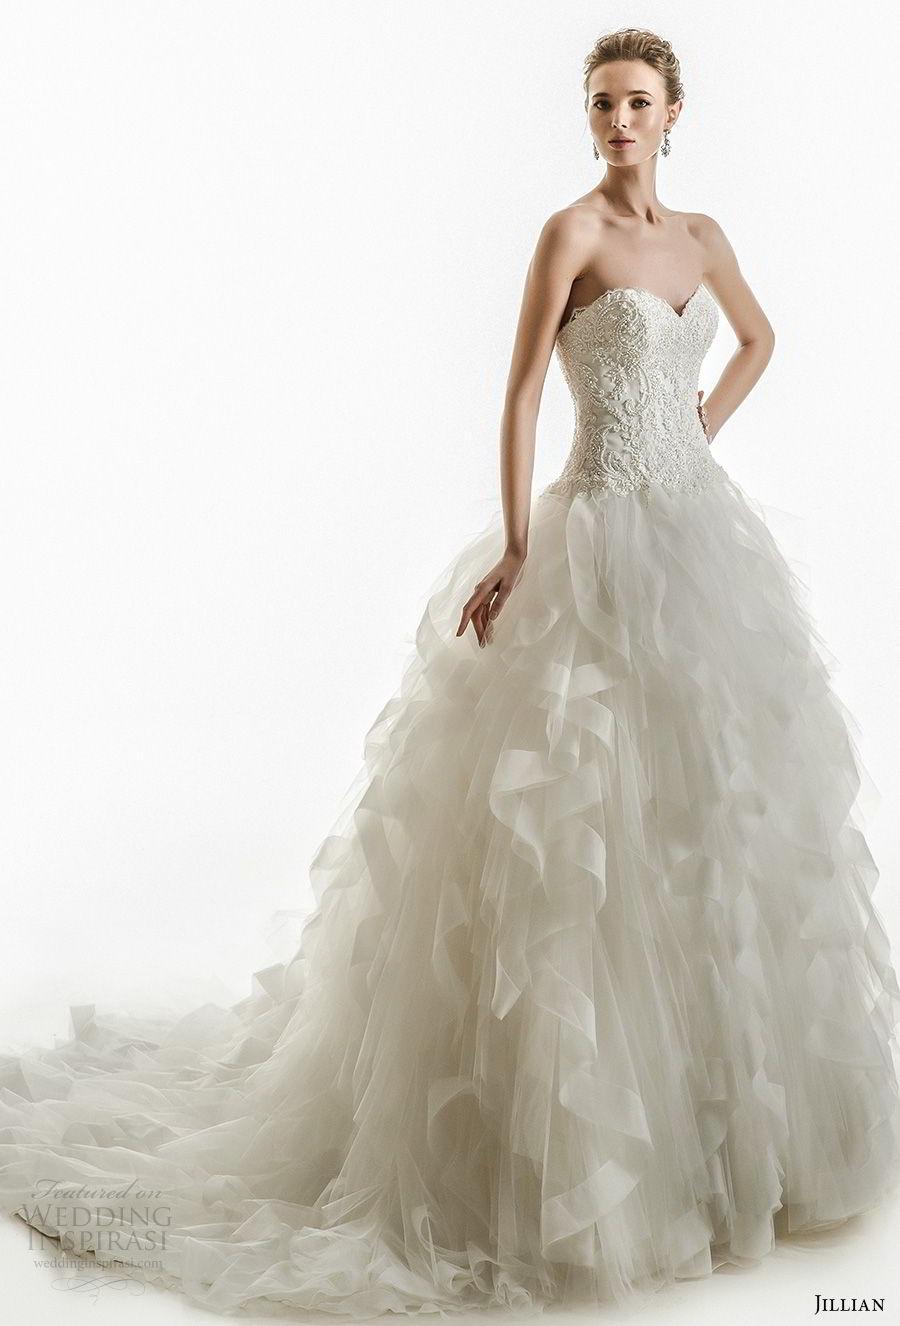 jillian 2018 bridal strapless sweetheart neckline heavily embellished bodice princess ball gown ruffled skirt wedding dress chapel train (13) mv